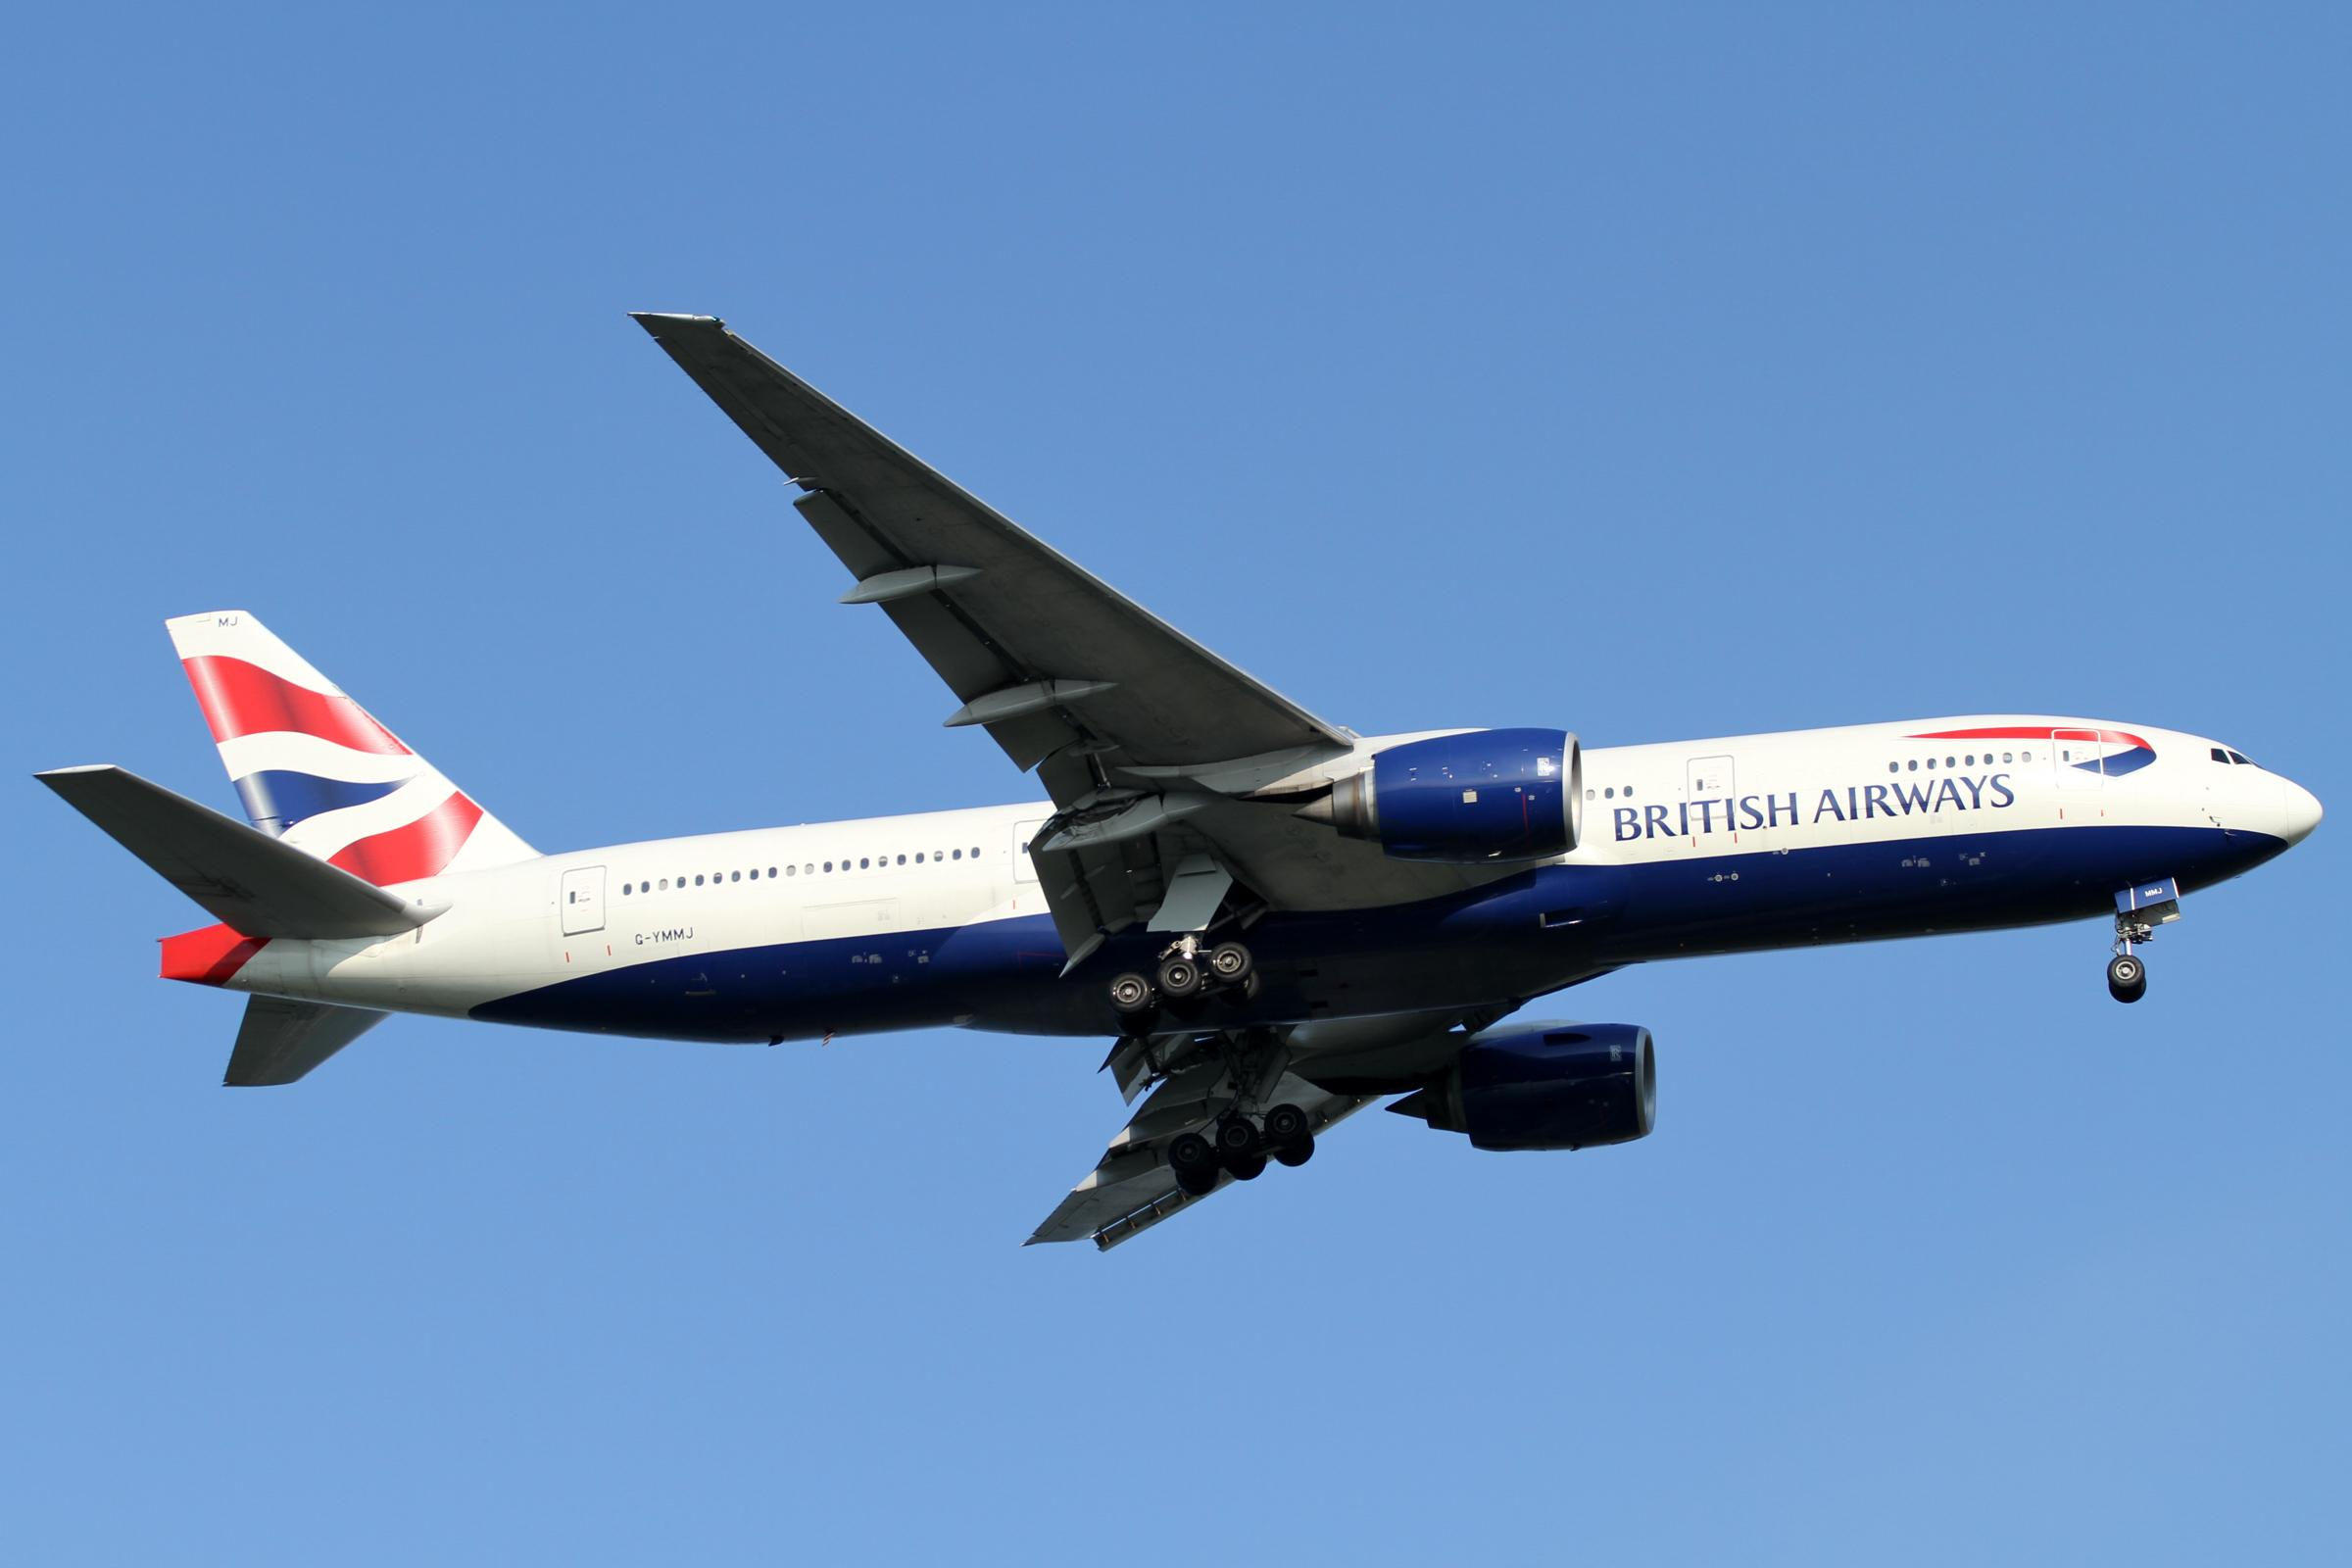 British Airways - WiFi gratis en el avion